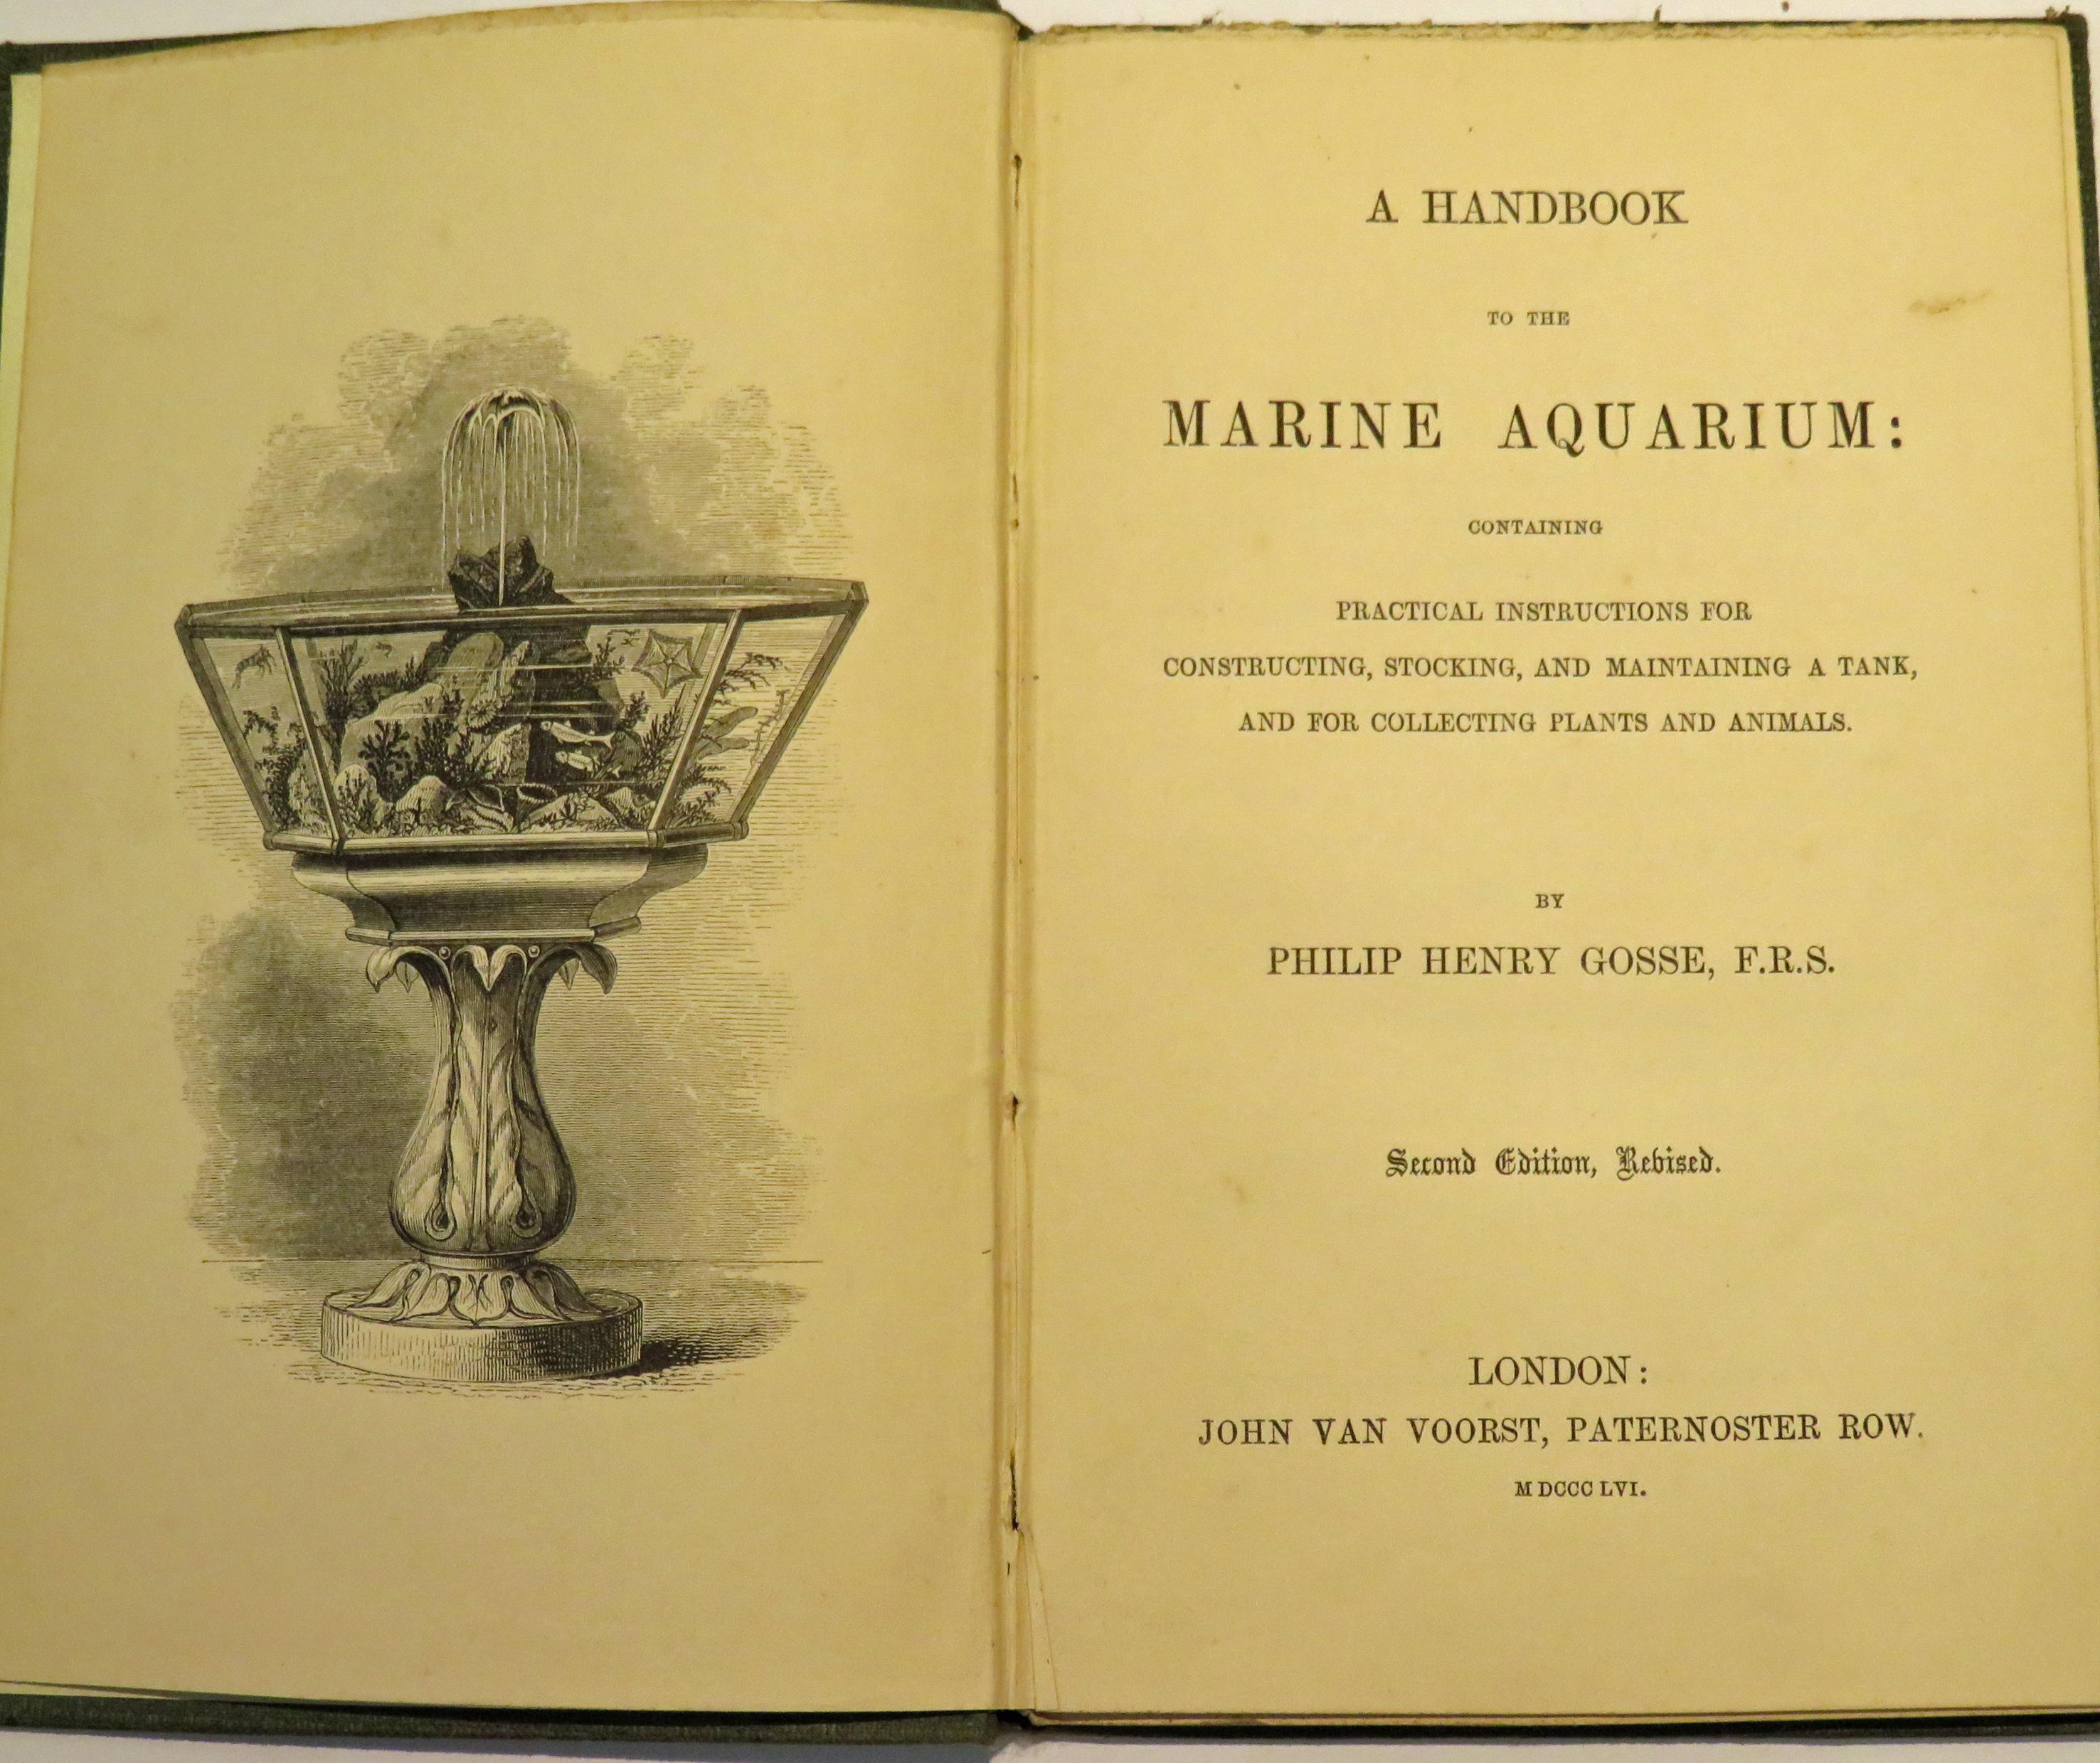 A Handbook to the Marine Aquarium